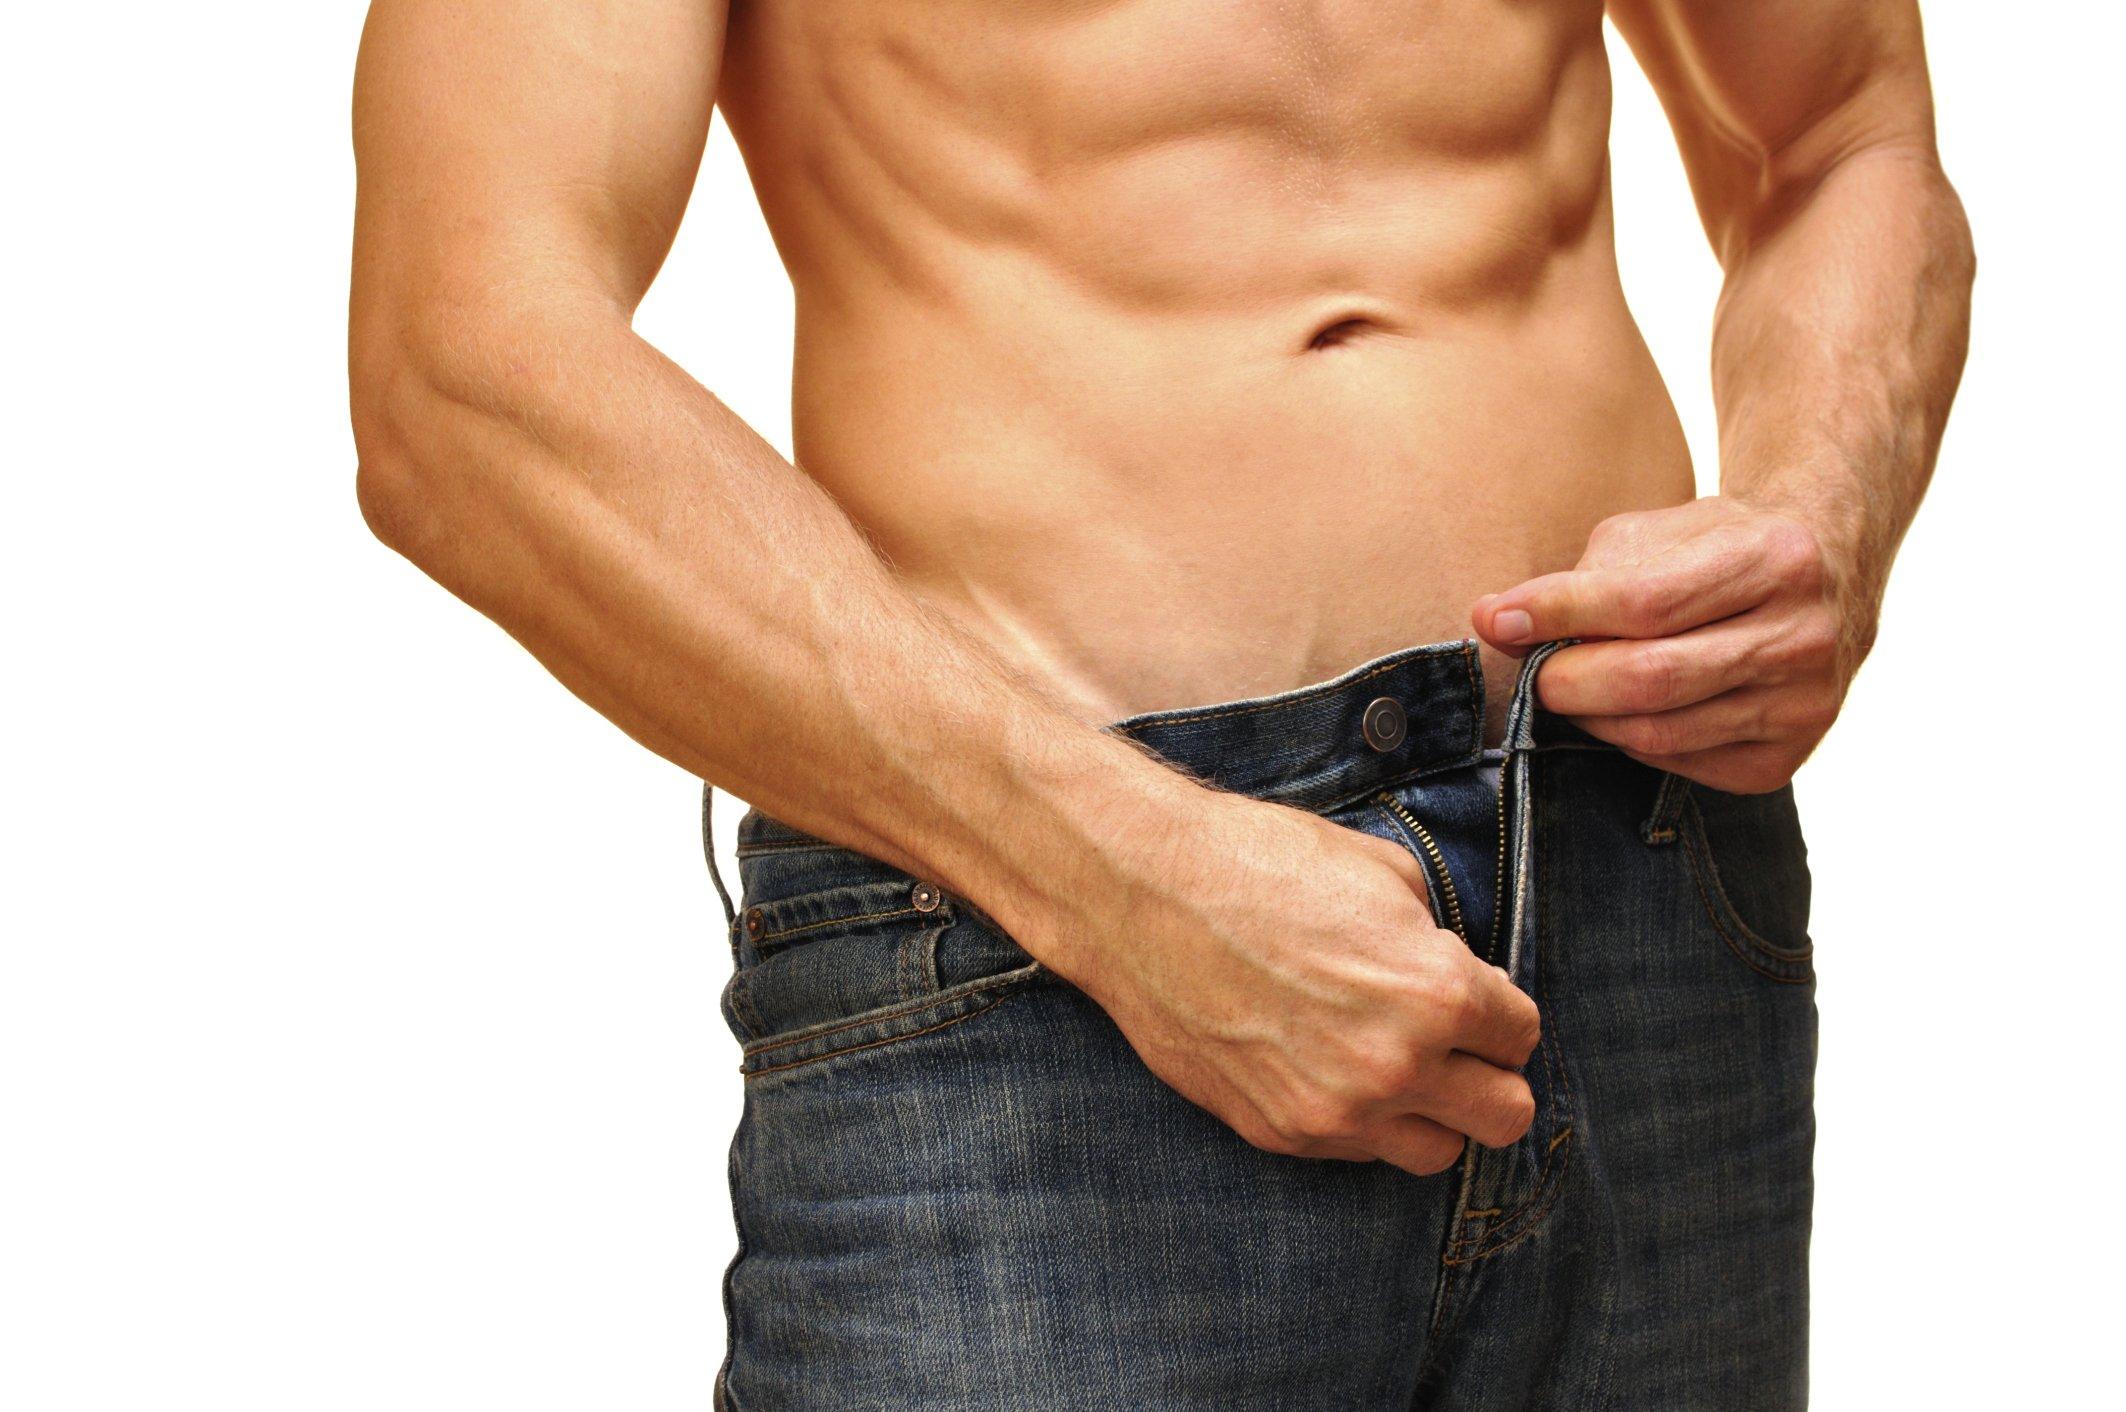 ¿Te implantarías un vibrador en el pene?